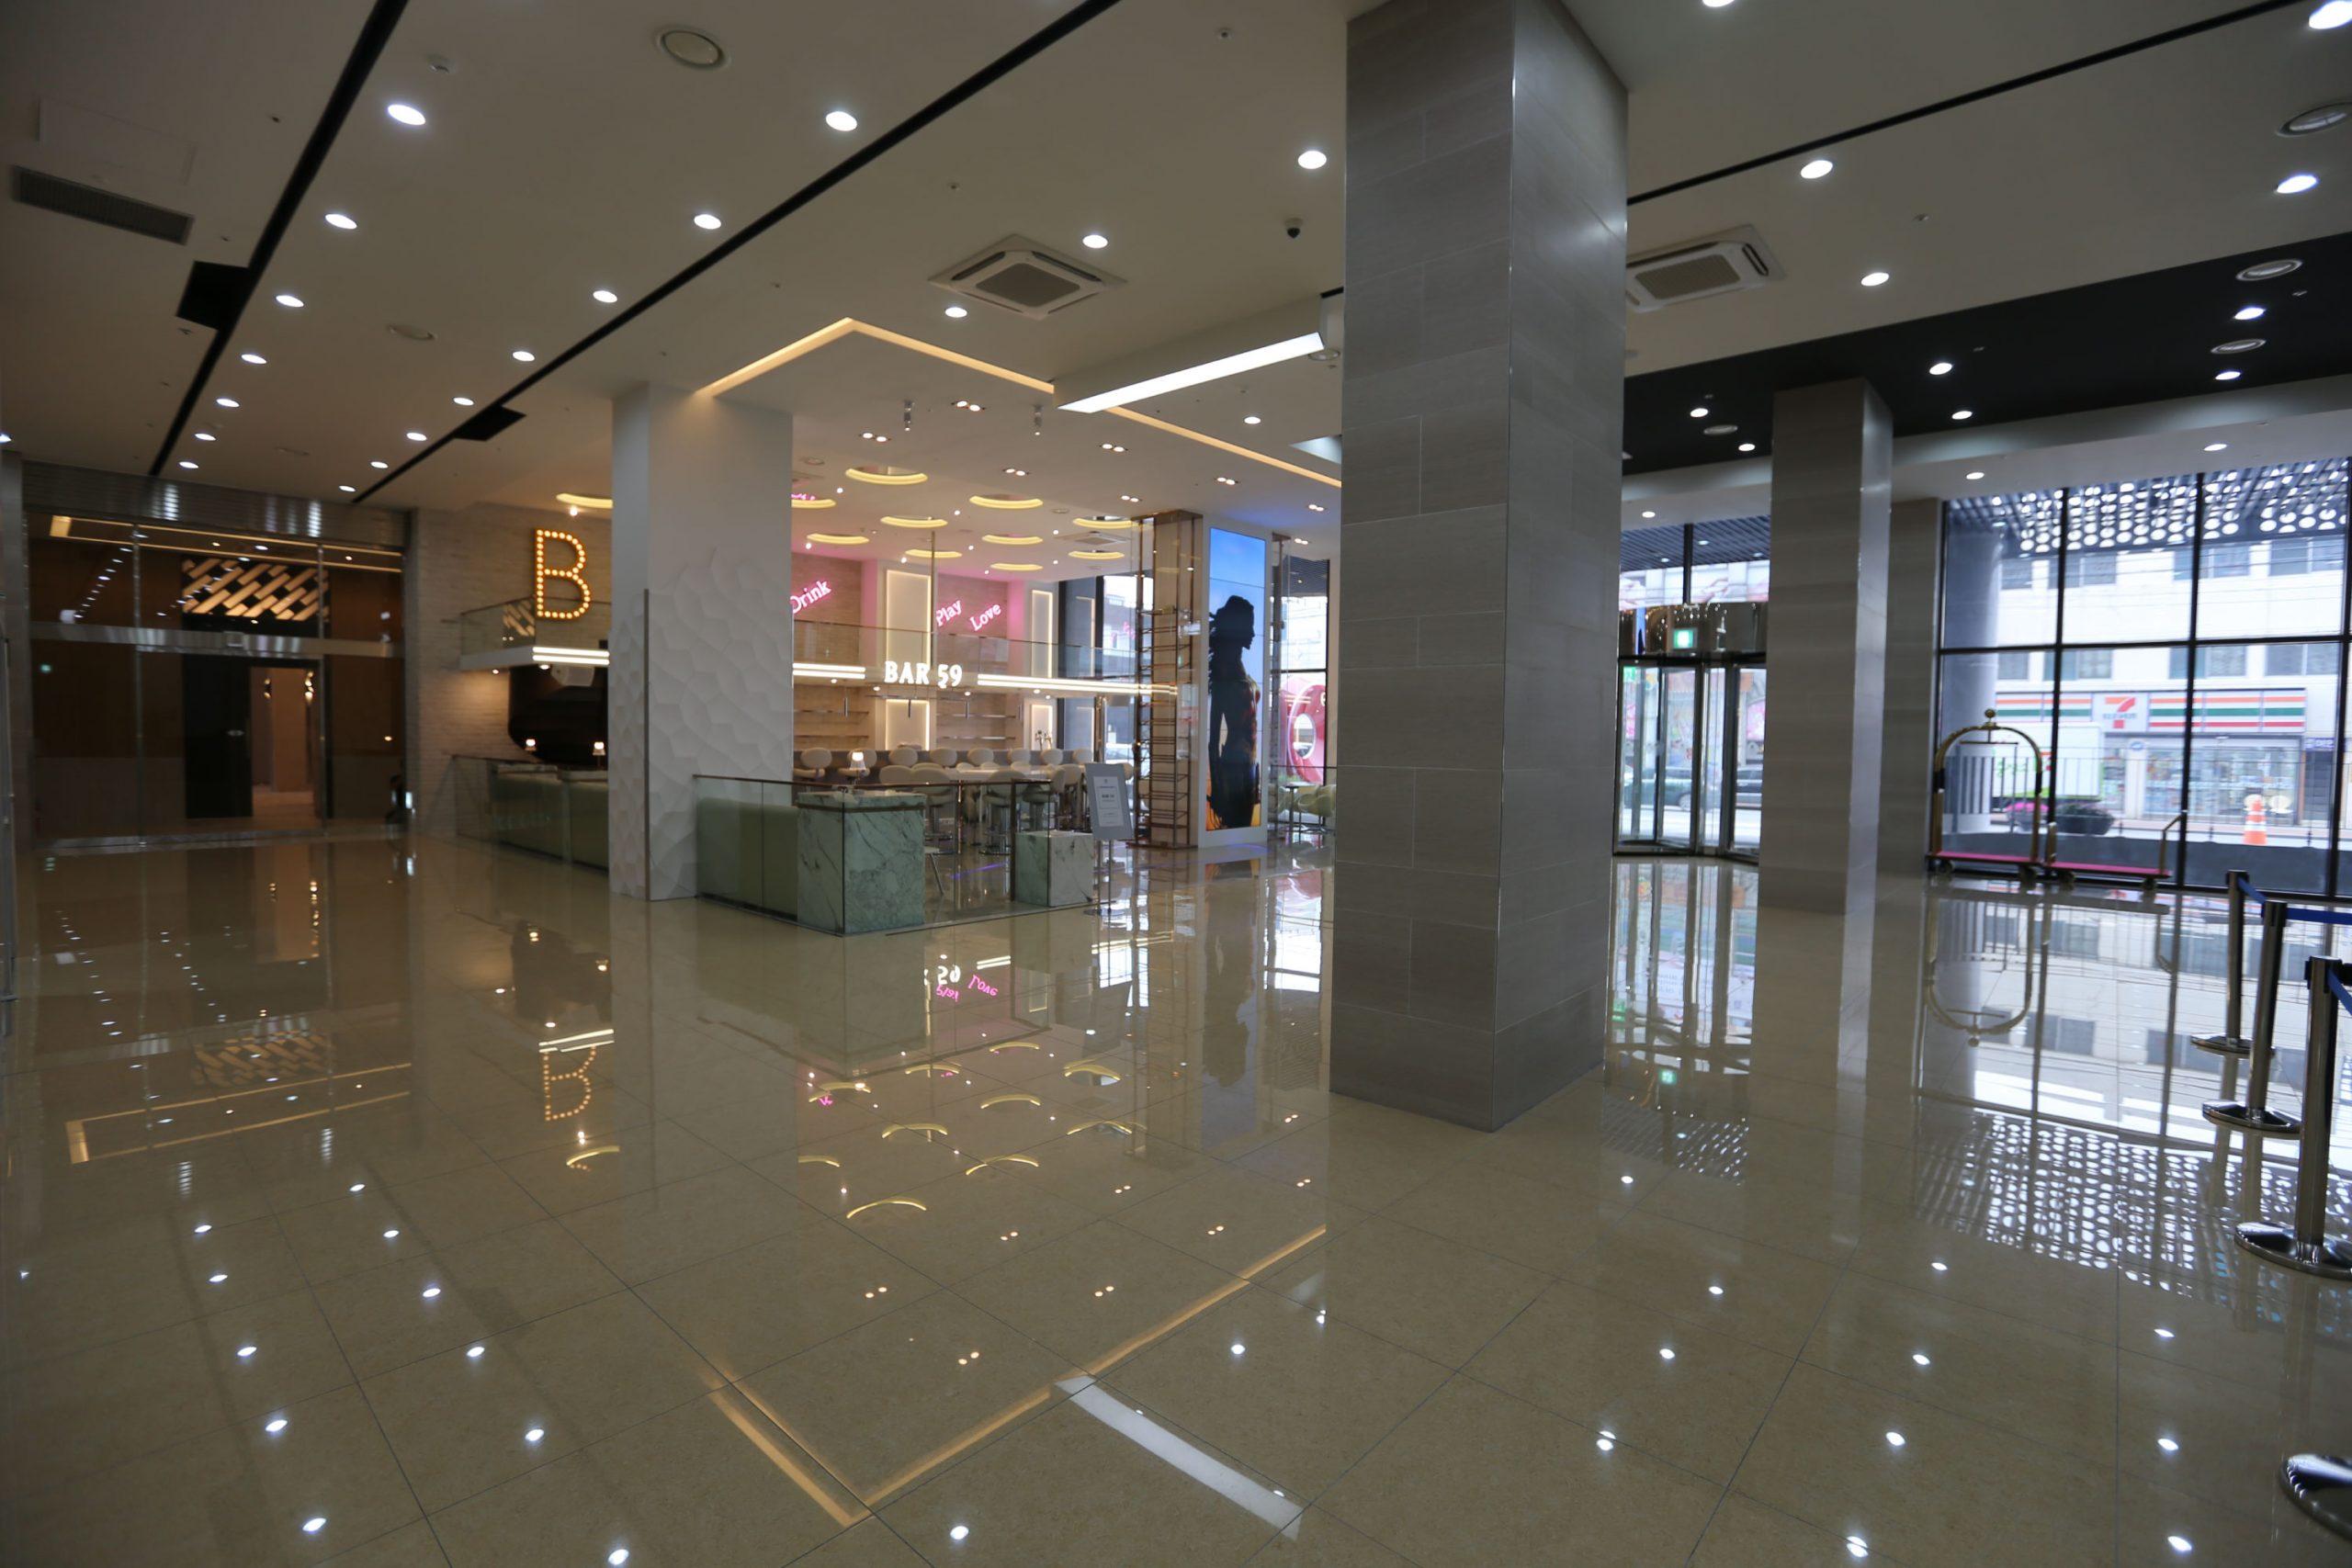 Bar59 강릉 씨베이 호텔 1층 로비 바